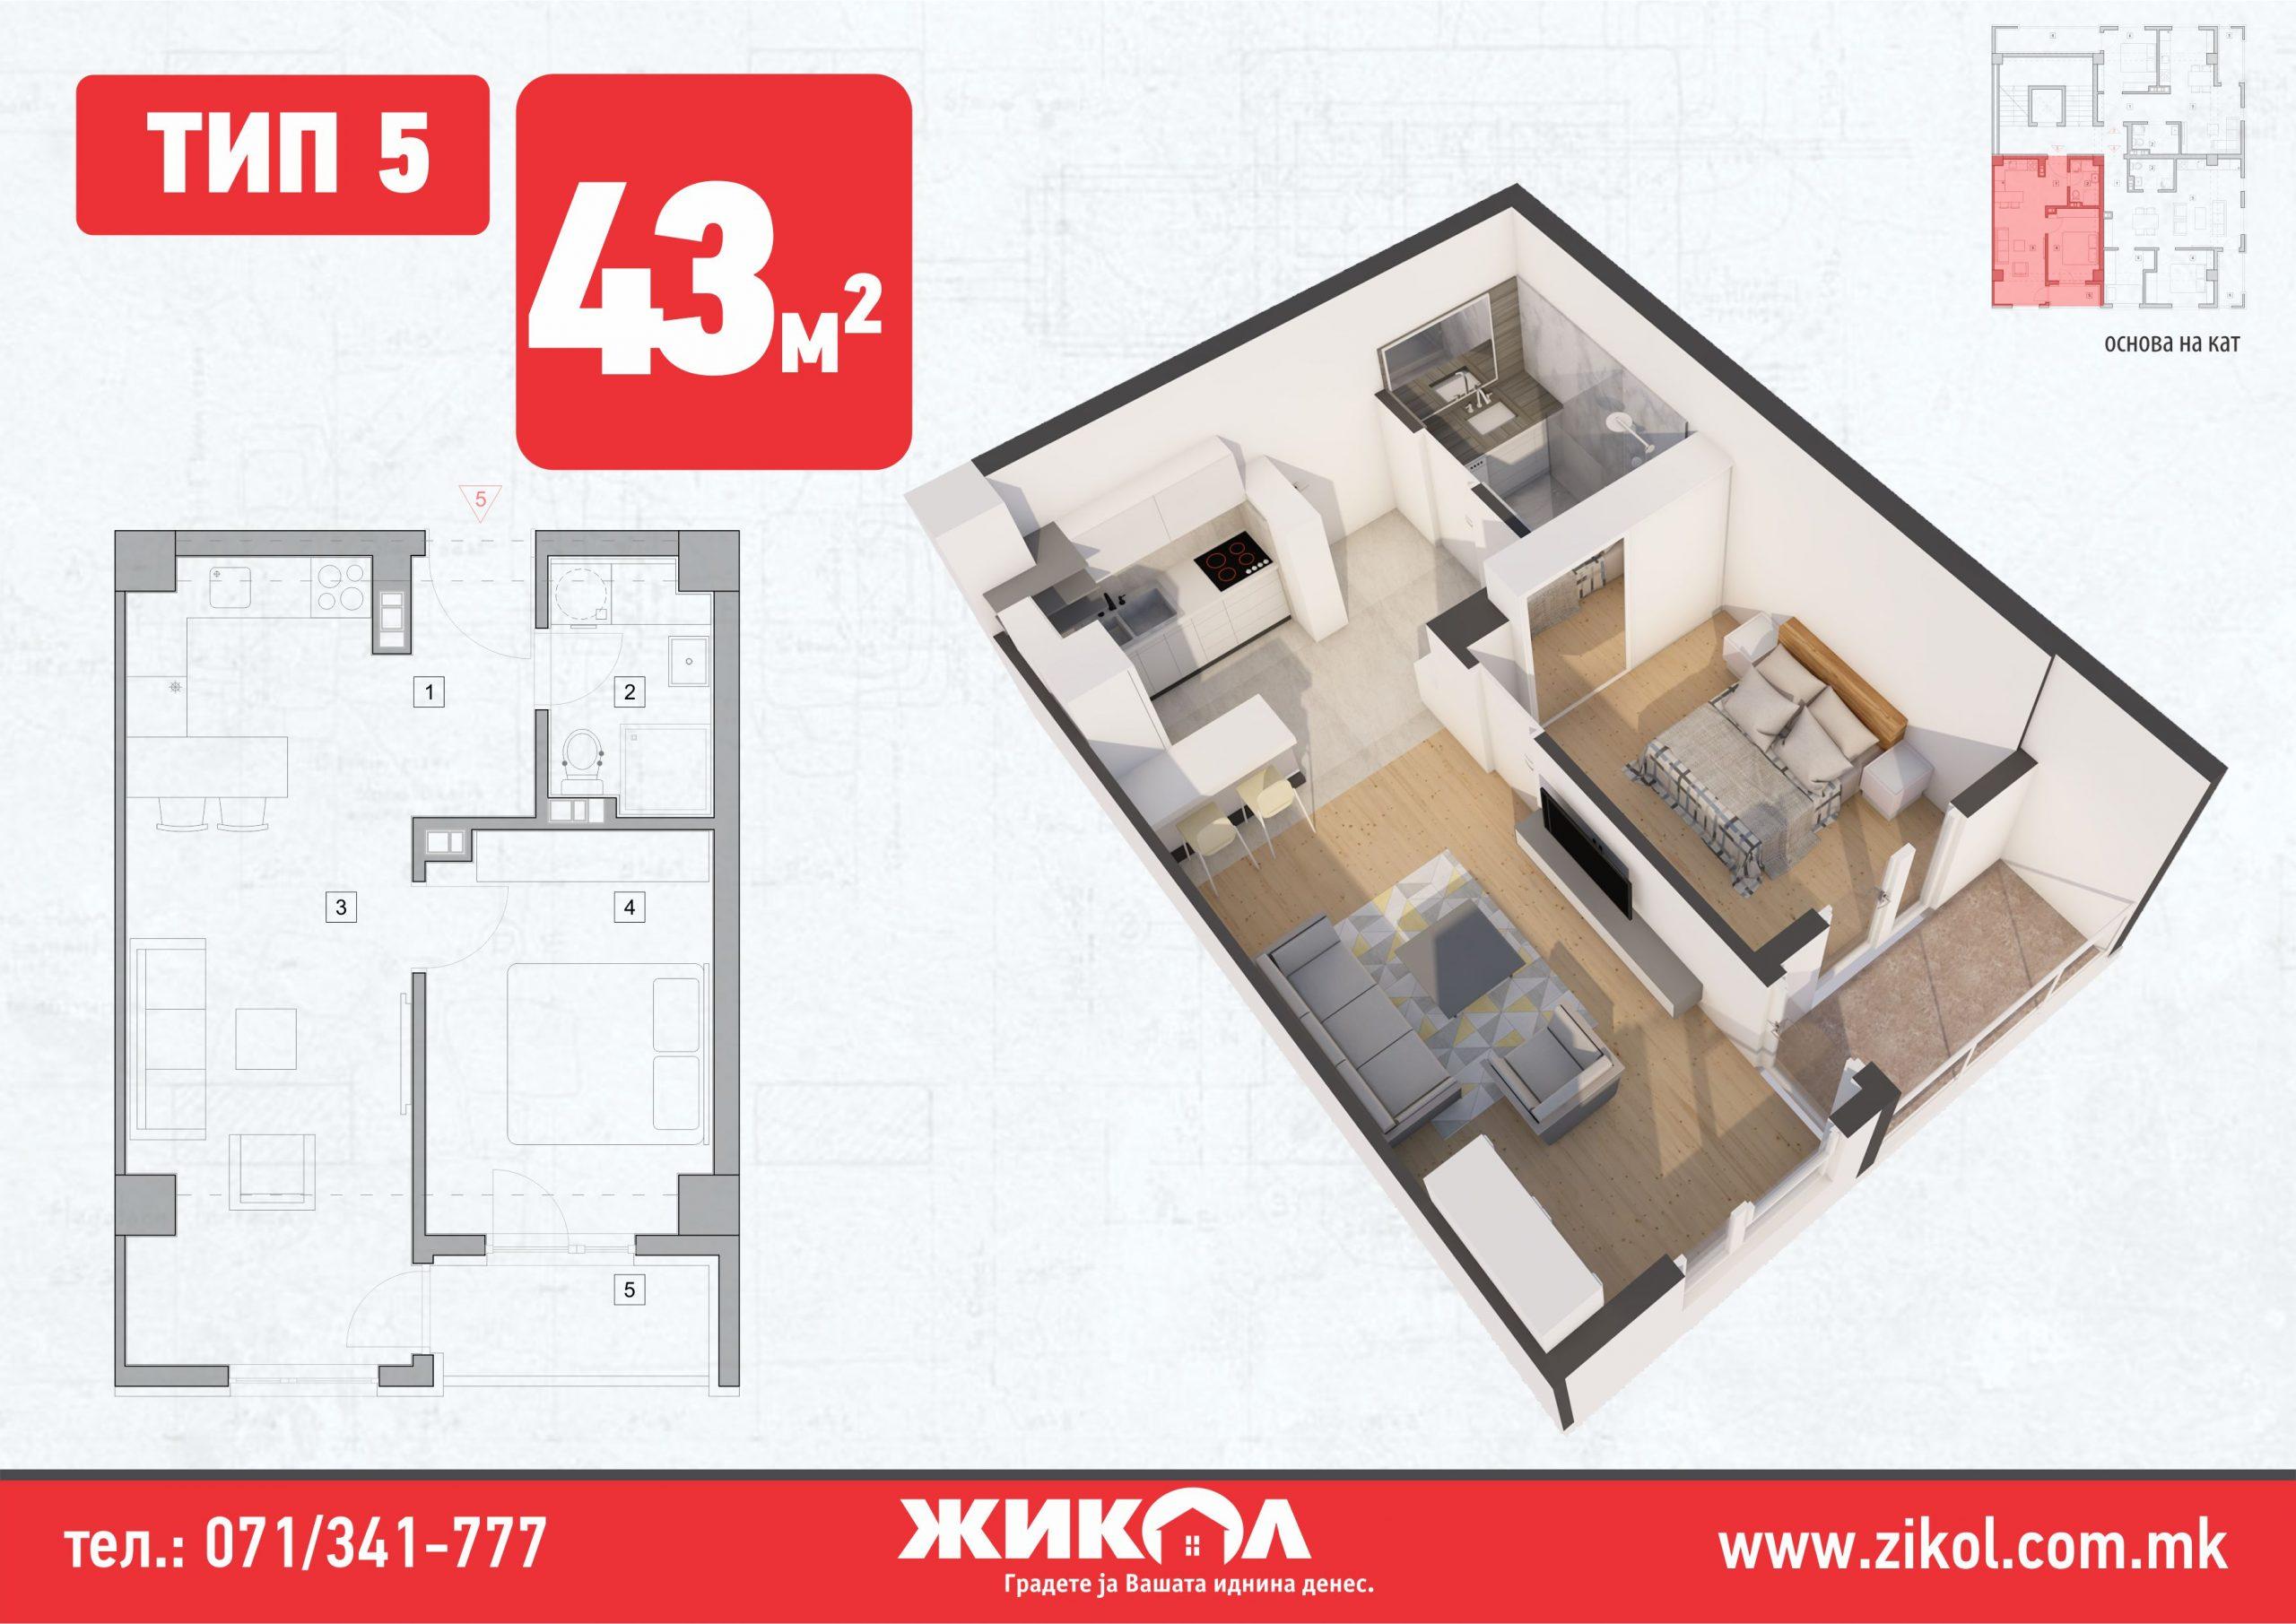 зграда 6, кат 3, стан 11